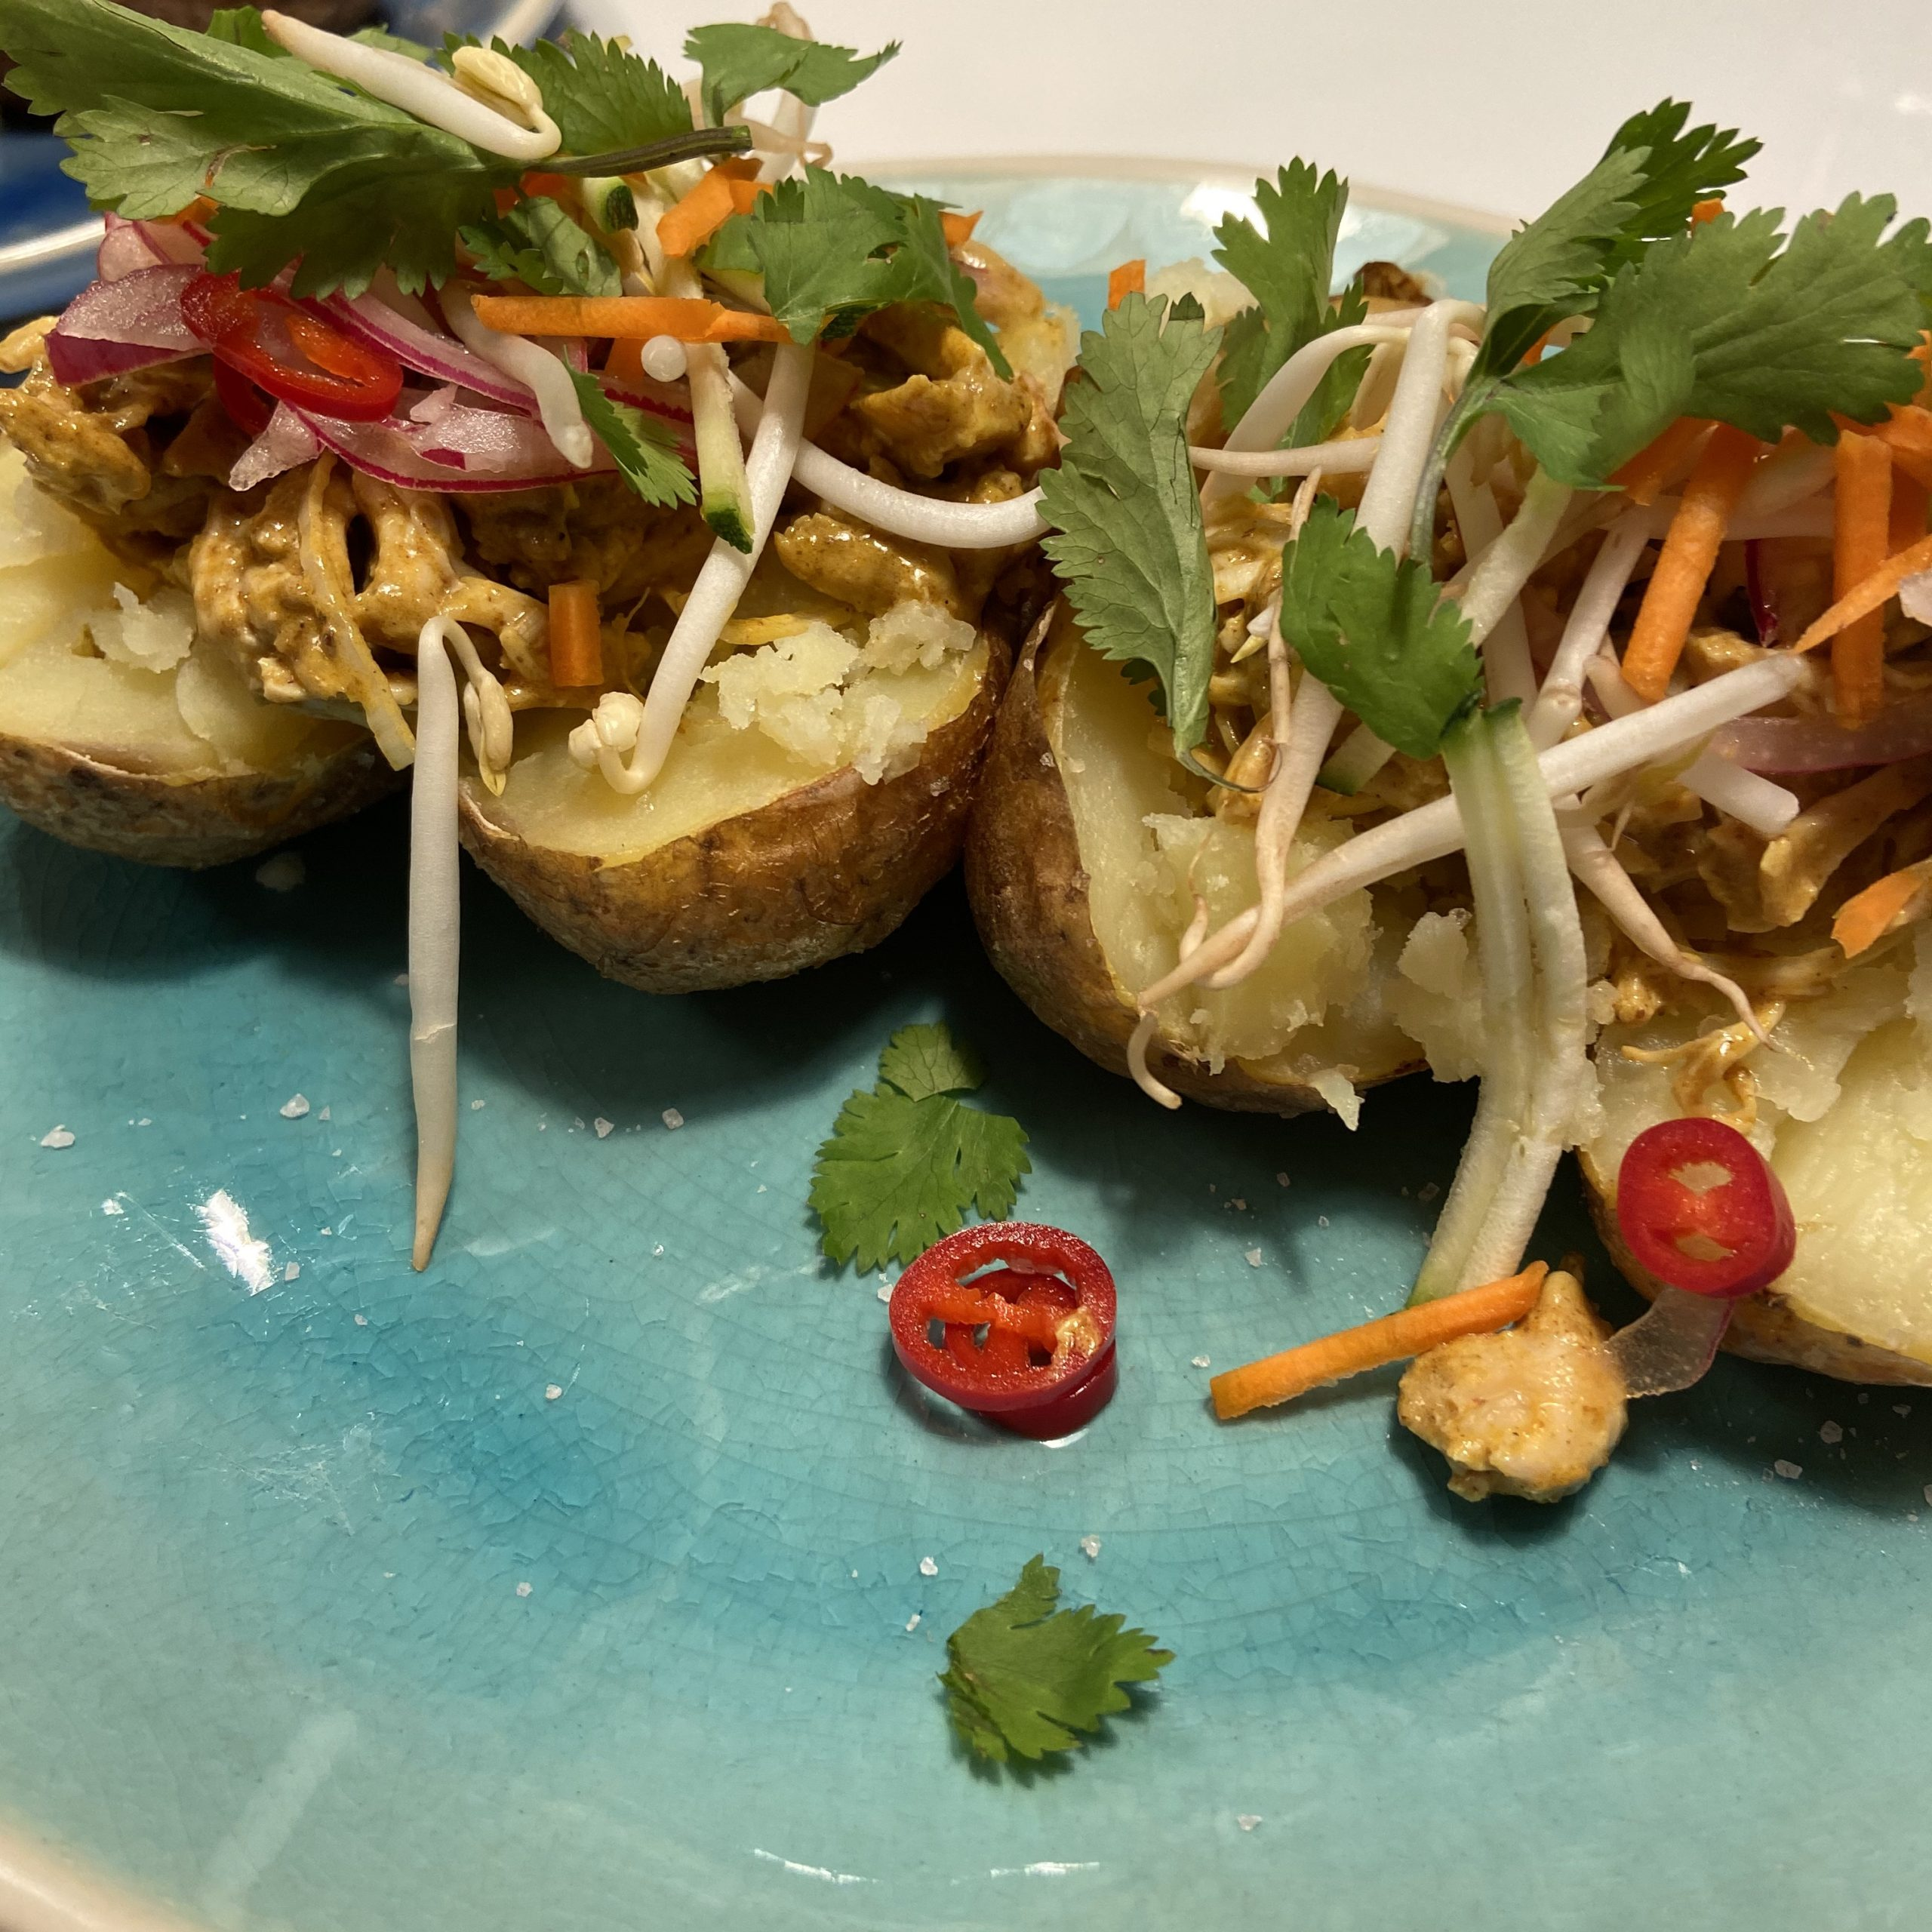 Gepofte aardappel met Thaise curry, pulled chicken, taugé en rode ui